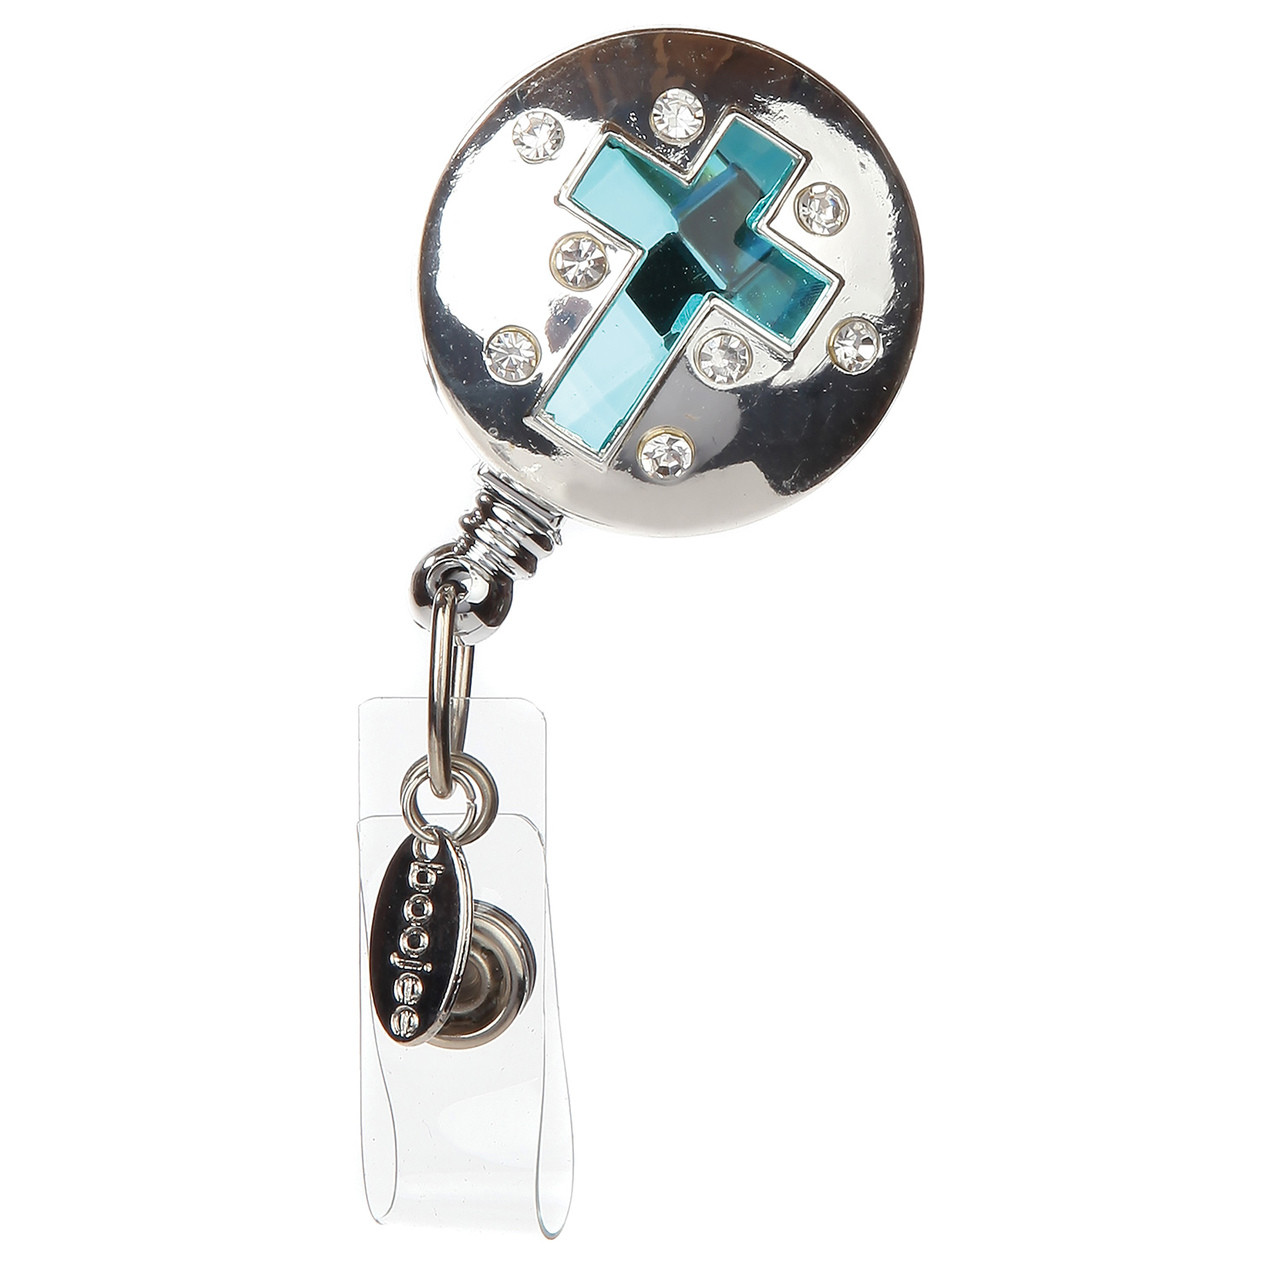 Religious Retractable Badge Reel Teacher Badge Reel Badge Holder Nurse Badge Reel Cross Badge Reel Badge Reel Nurse ID Badge Reel